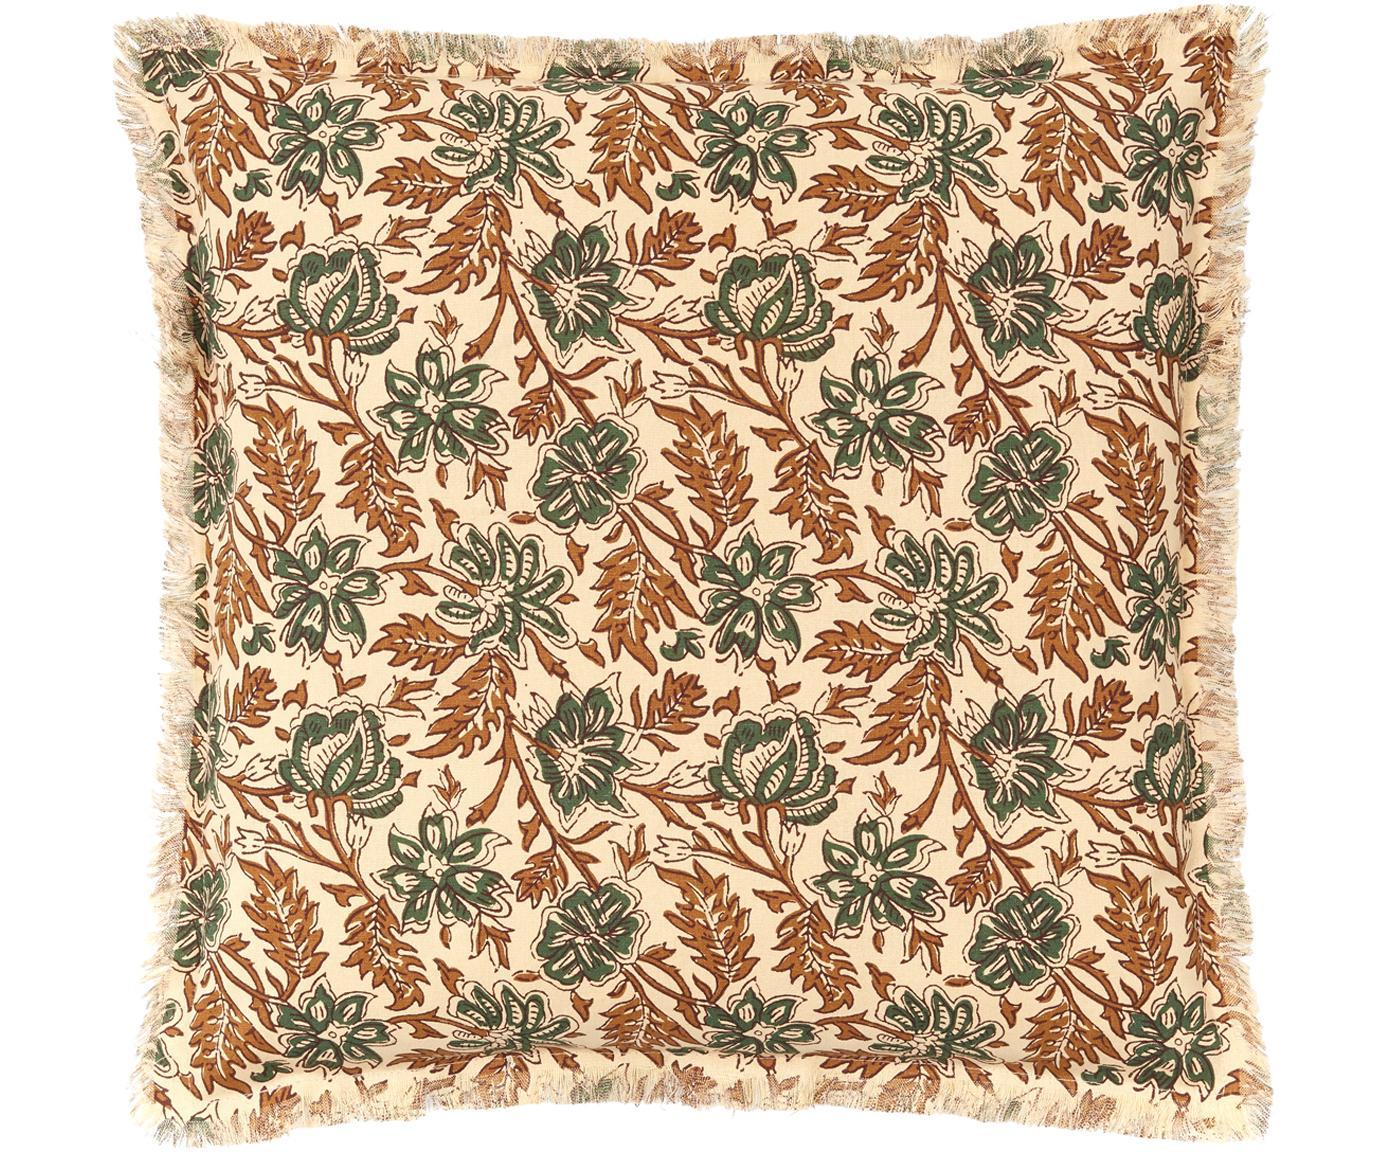 Federa arredo con frange Summerleaves, Cotone, Crema, verde, marrone, Larg. 50 x Lung. 50 cm